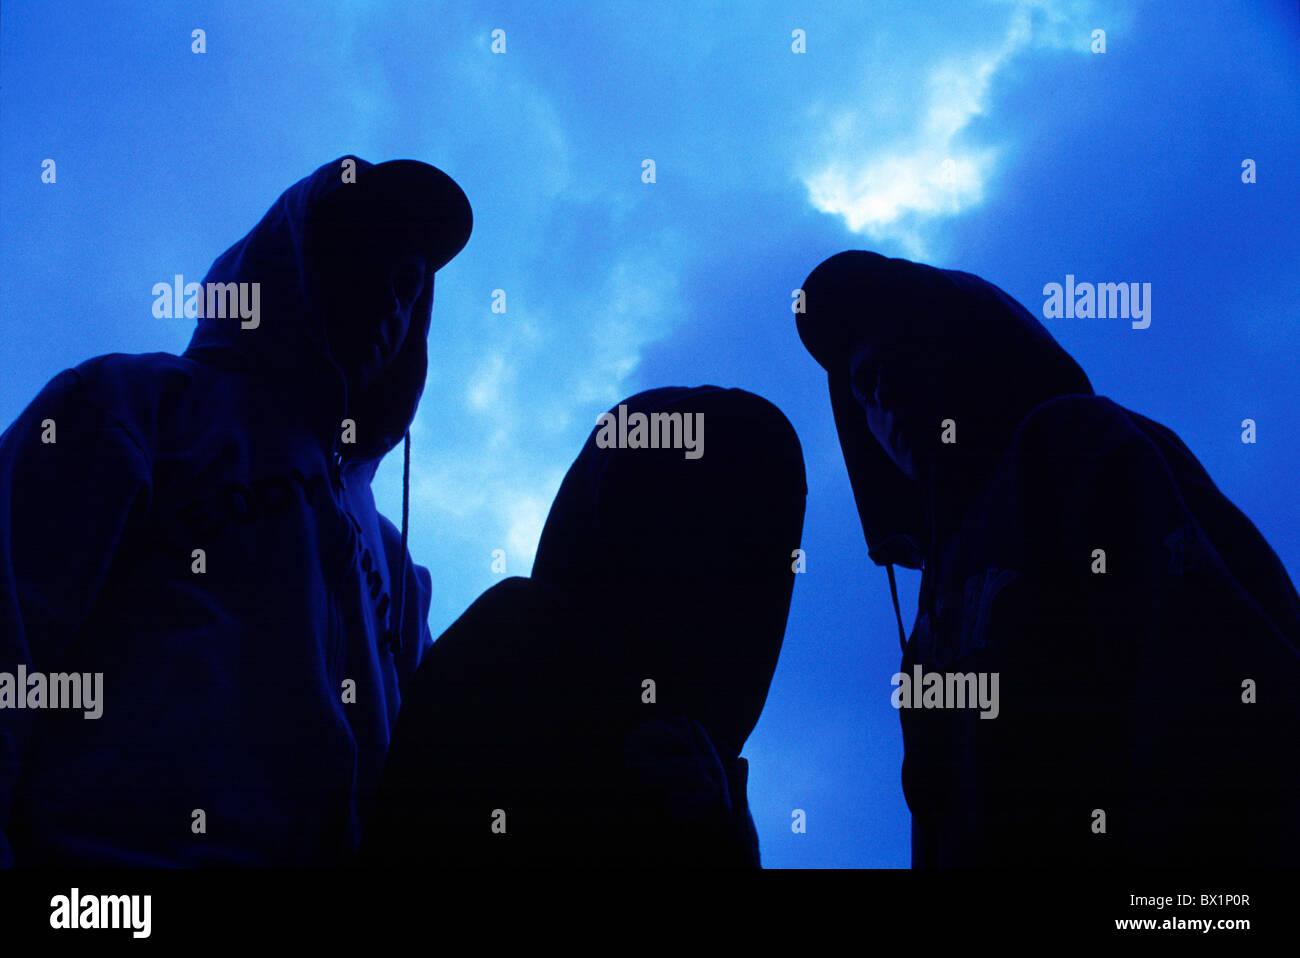 anonymously Boy limited boys darkly dusk Hip-hop hoods Lifestyle portraits teenagers three boys twilight - Stock Image